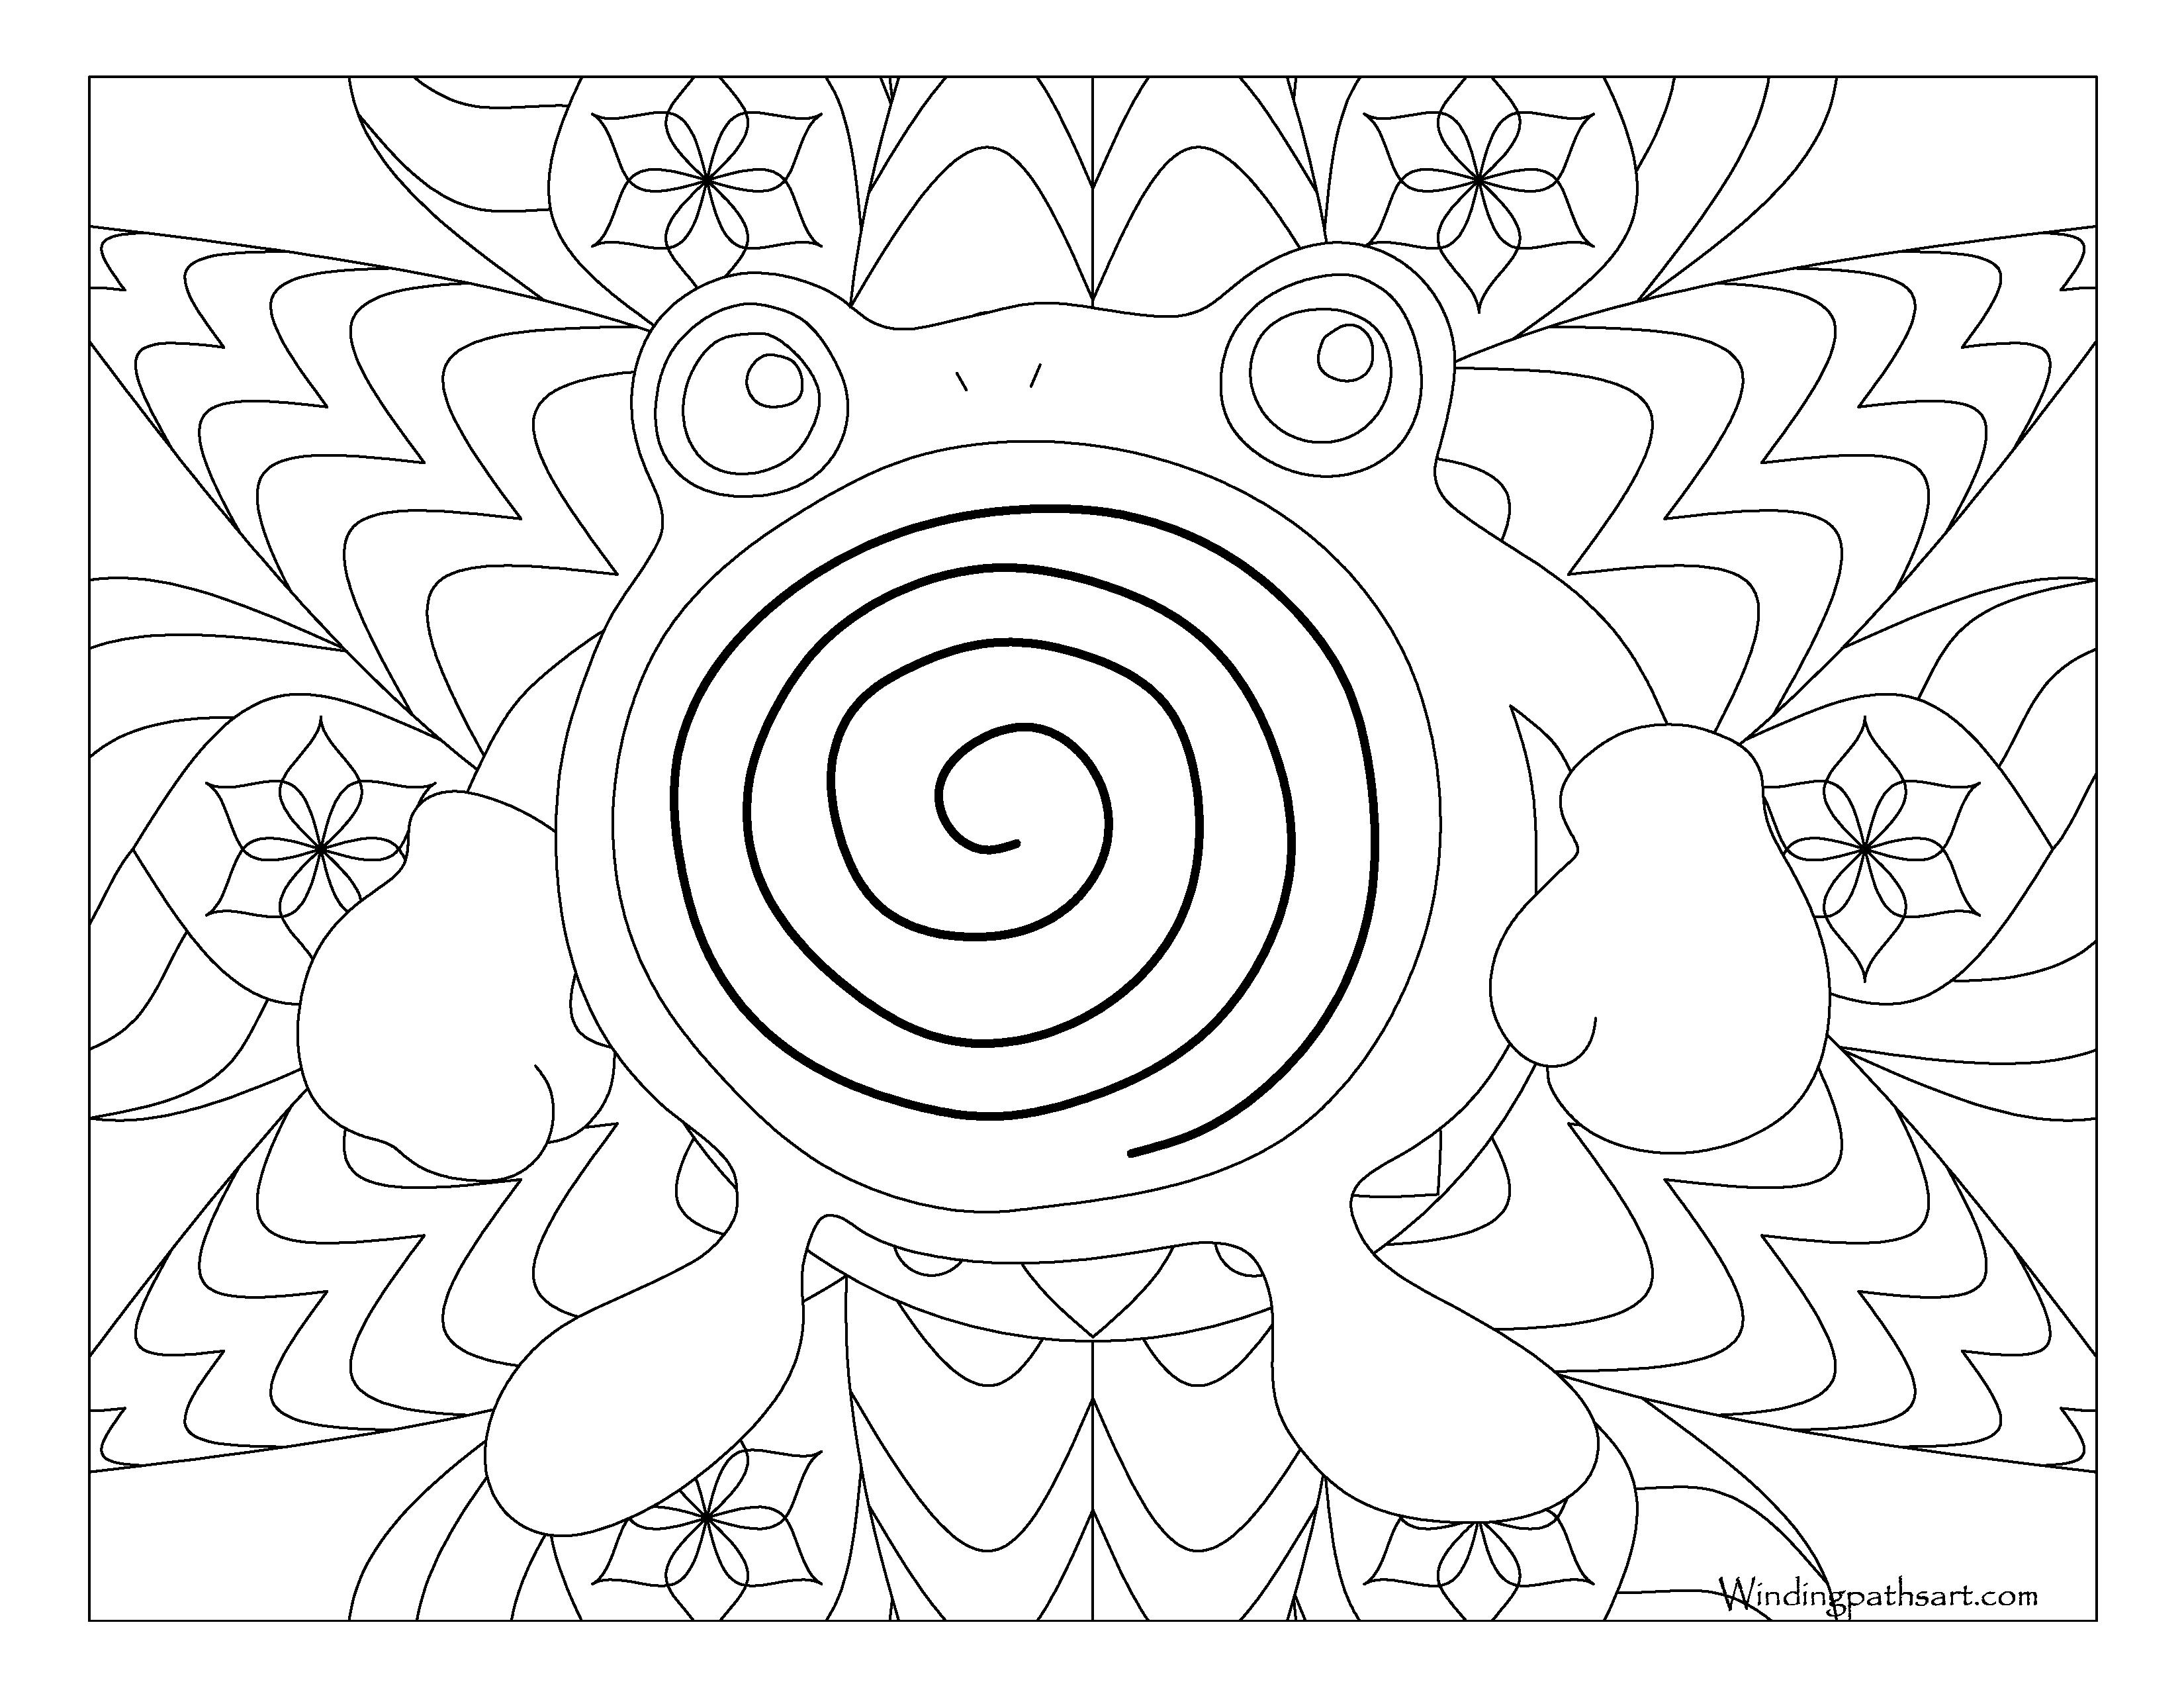 #061 Poliwhirl Pokemon Coloring Page · Windingpathsart.com